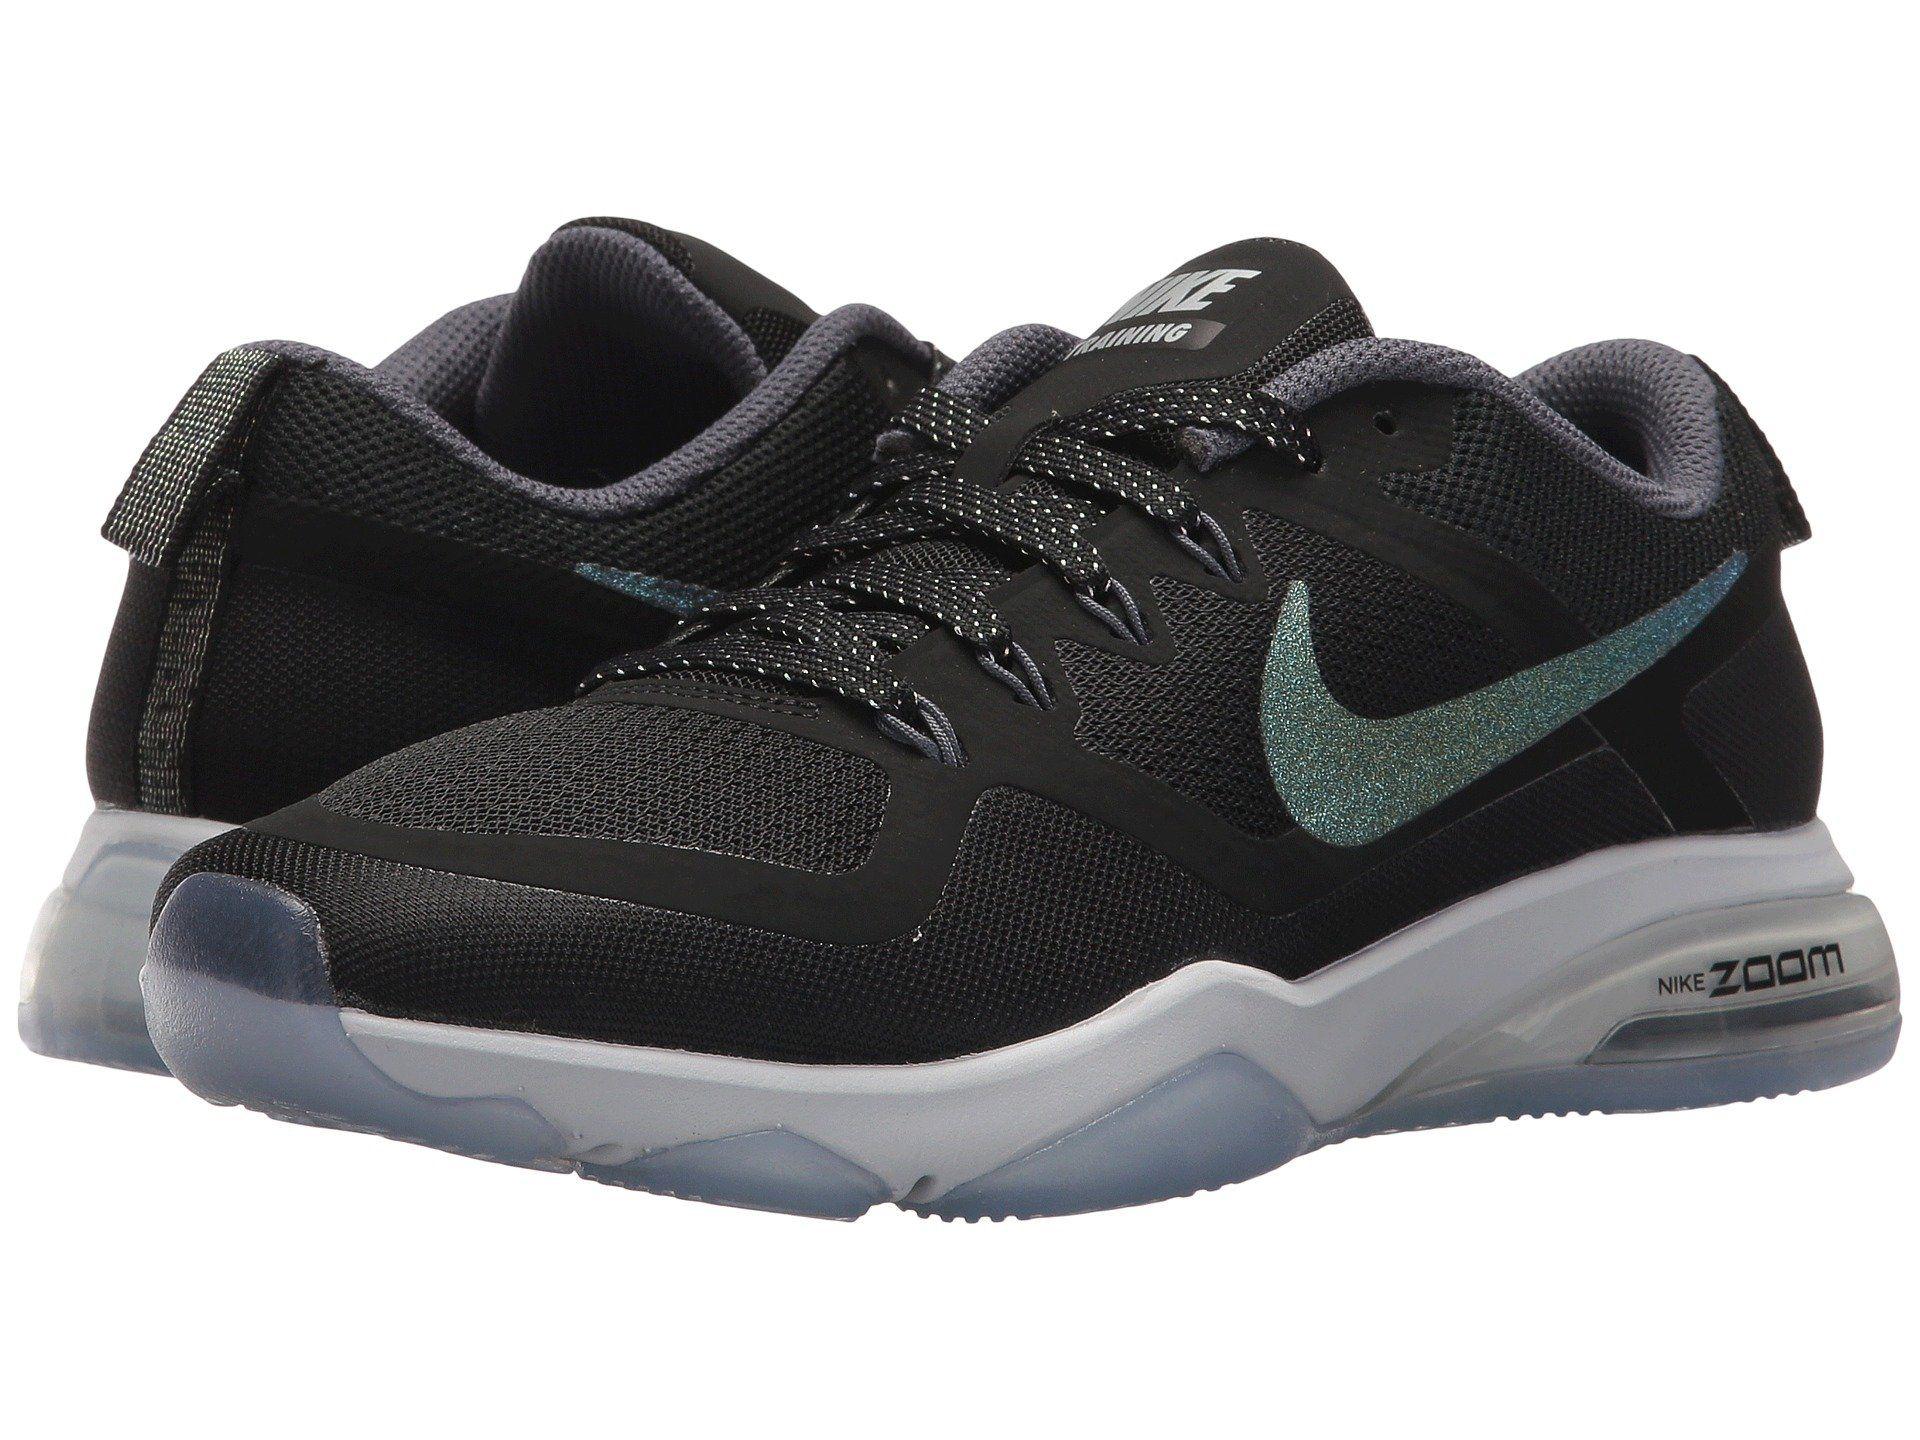 57a6b8899aaa9 NIKE Zoom Fitness Metallic Training. #nike #shoes # | Nike | Nike ...